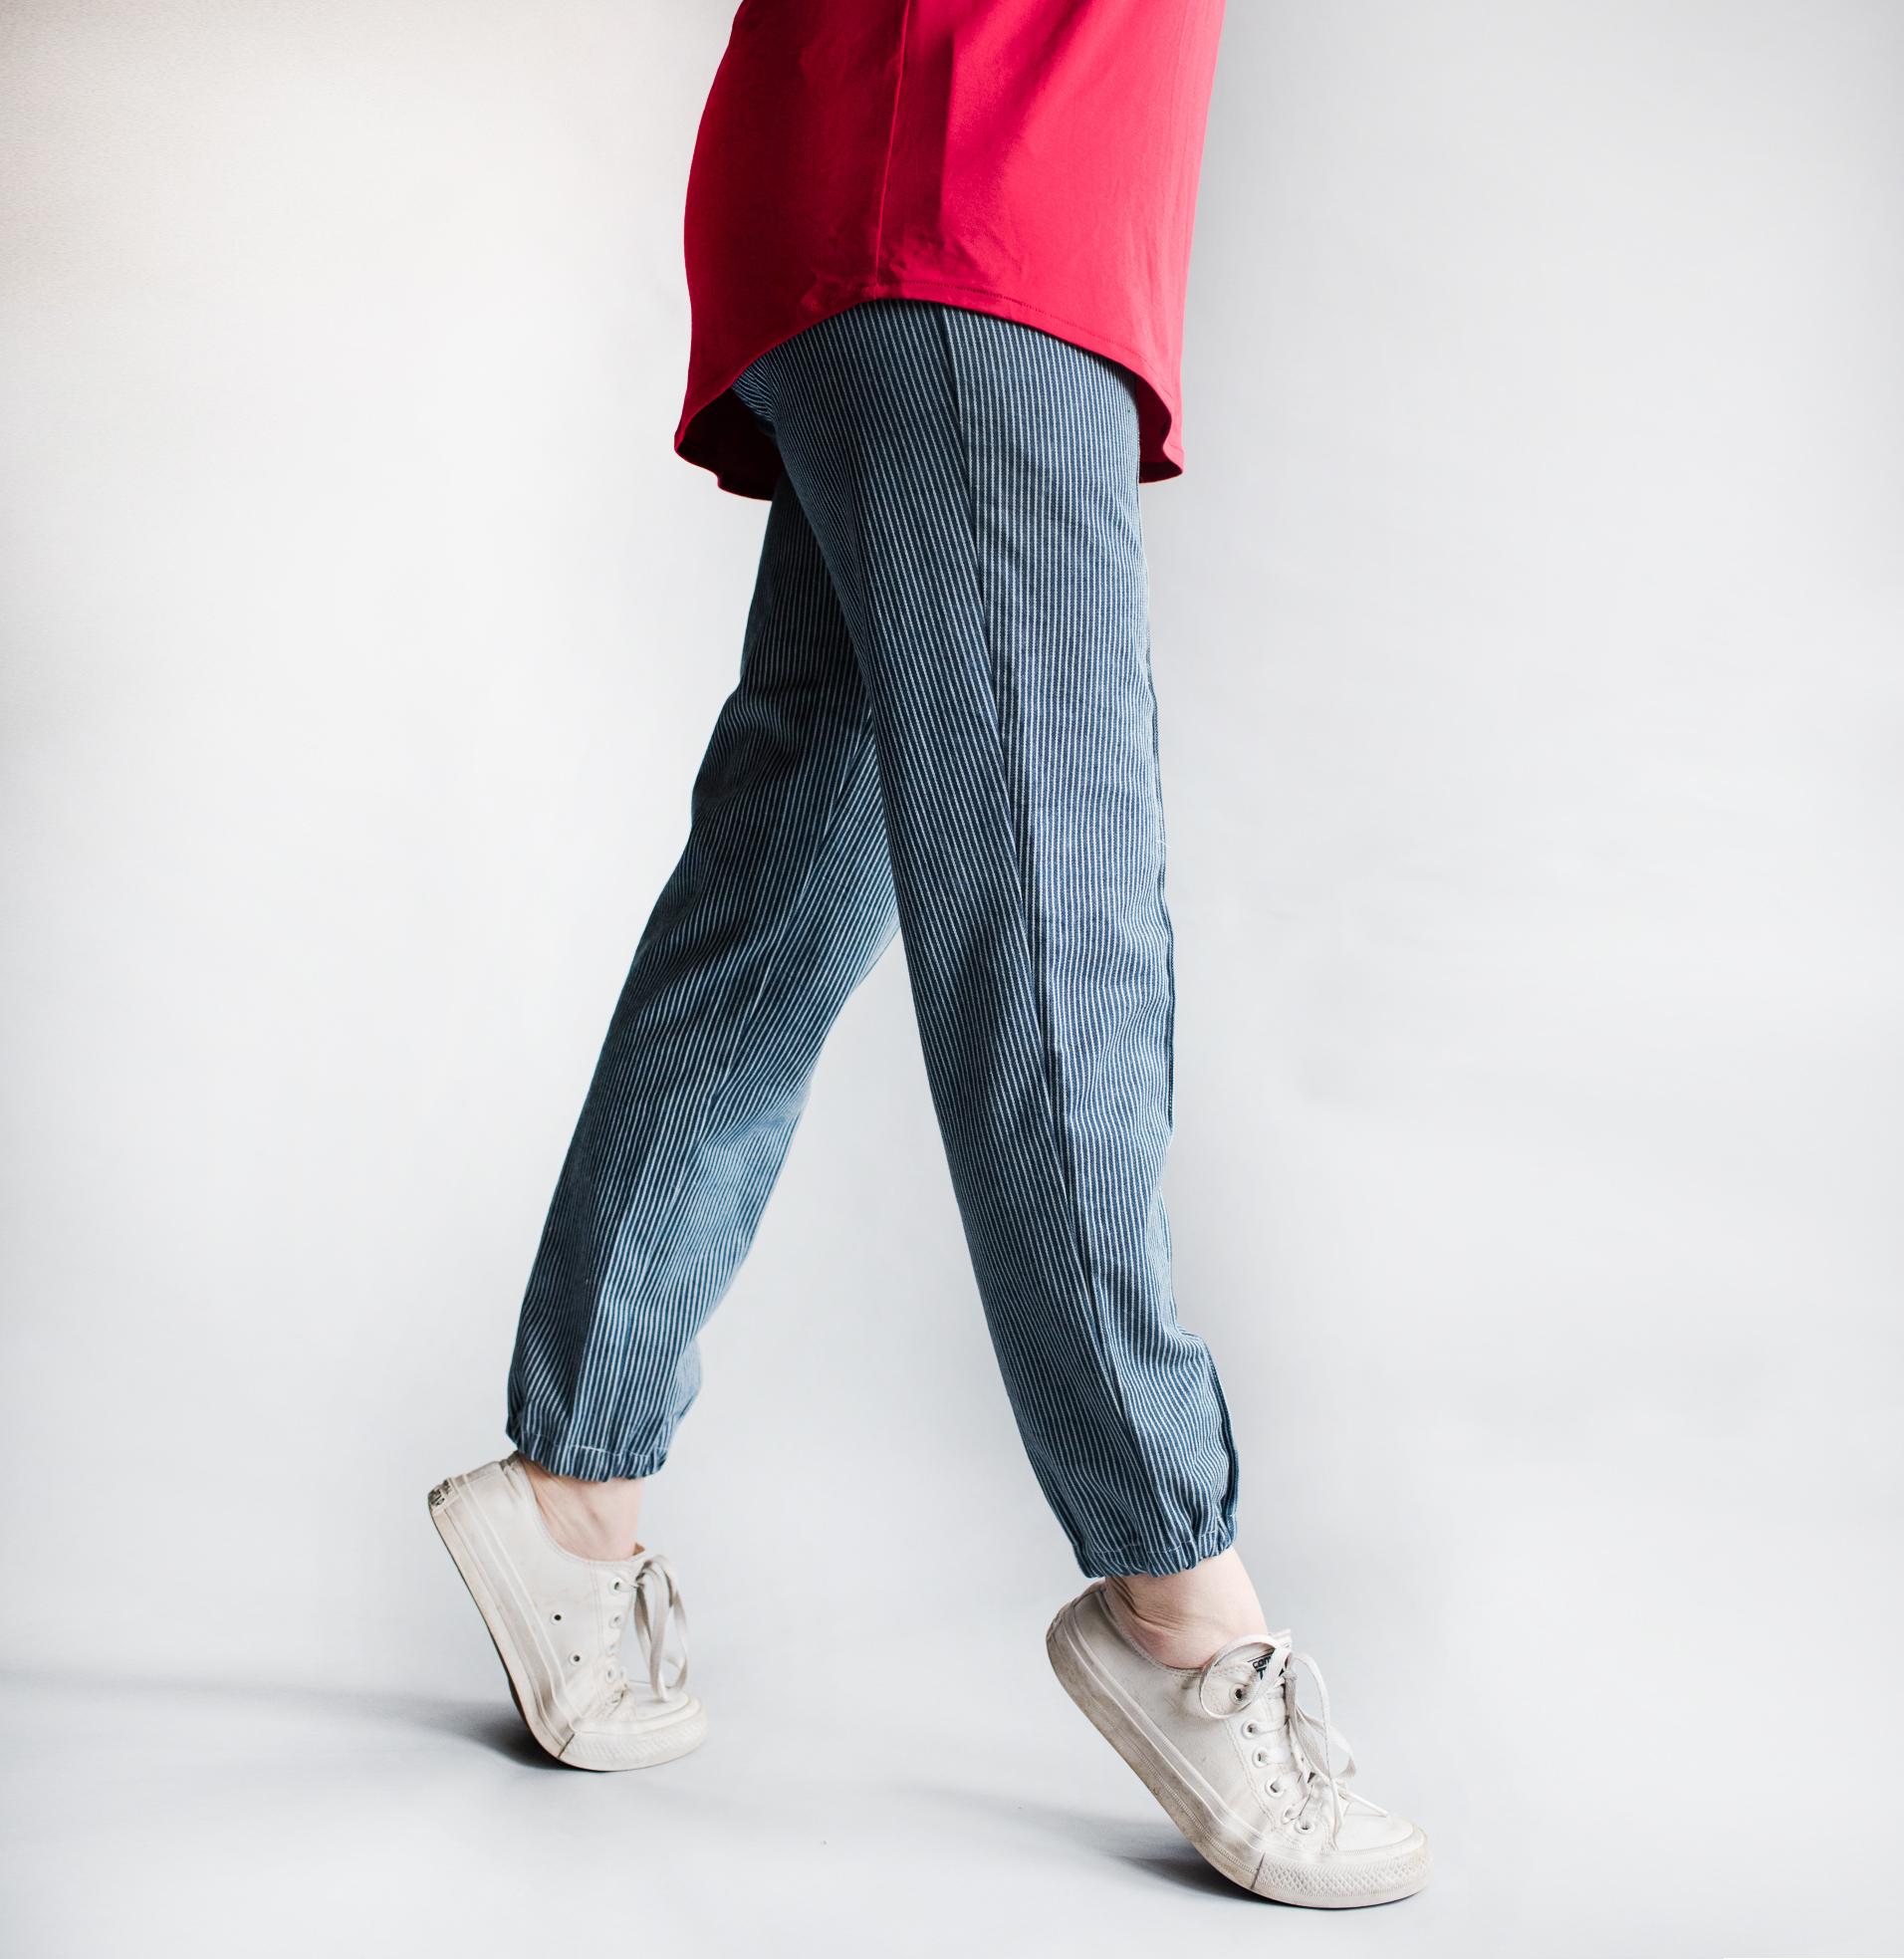 robinson-pdf-sewing-trouser38.jpg